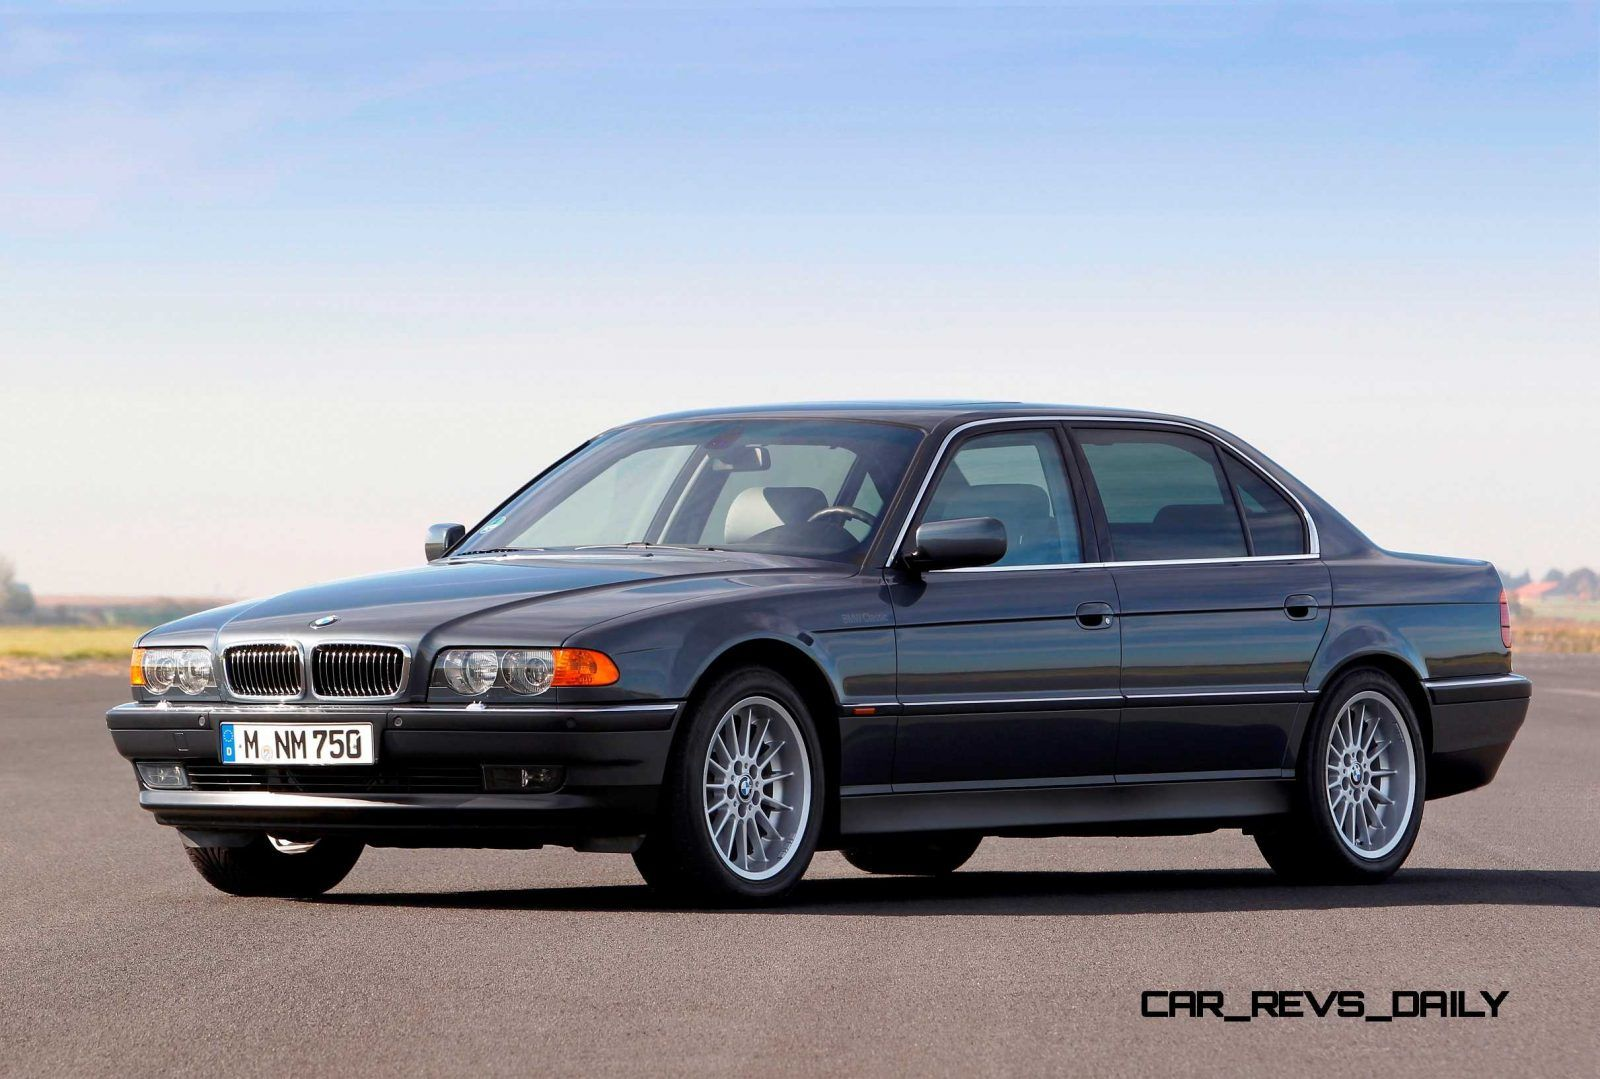 BMW V12 Turns 25! Celebrating the Evolution of the V12 BMW 7